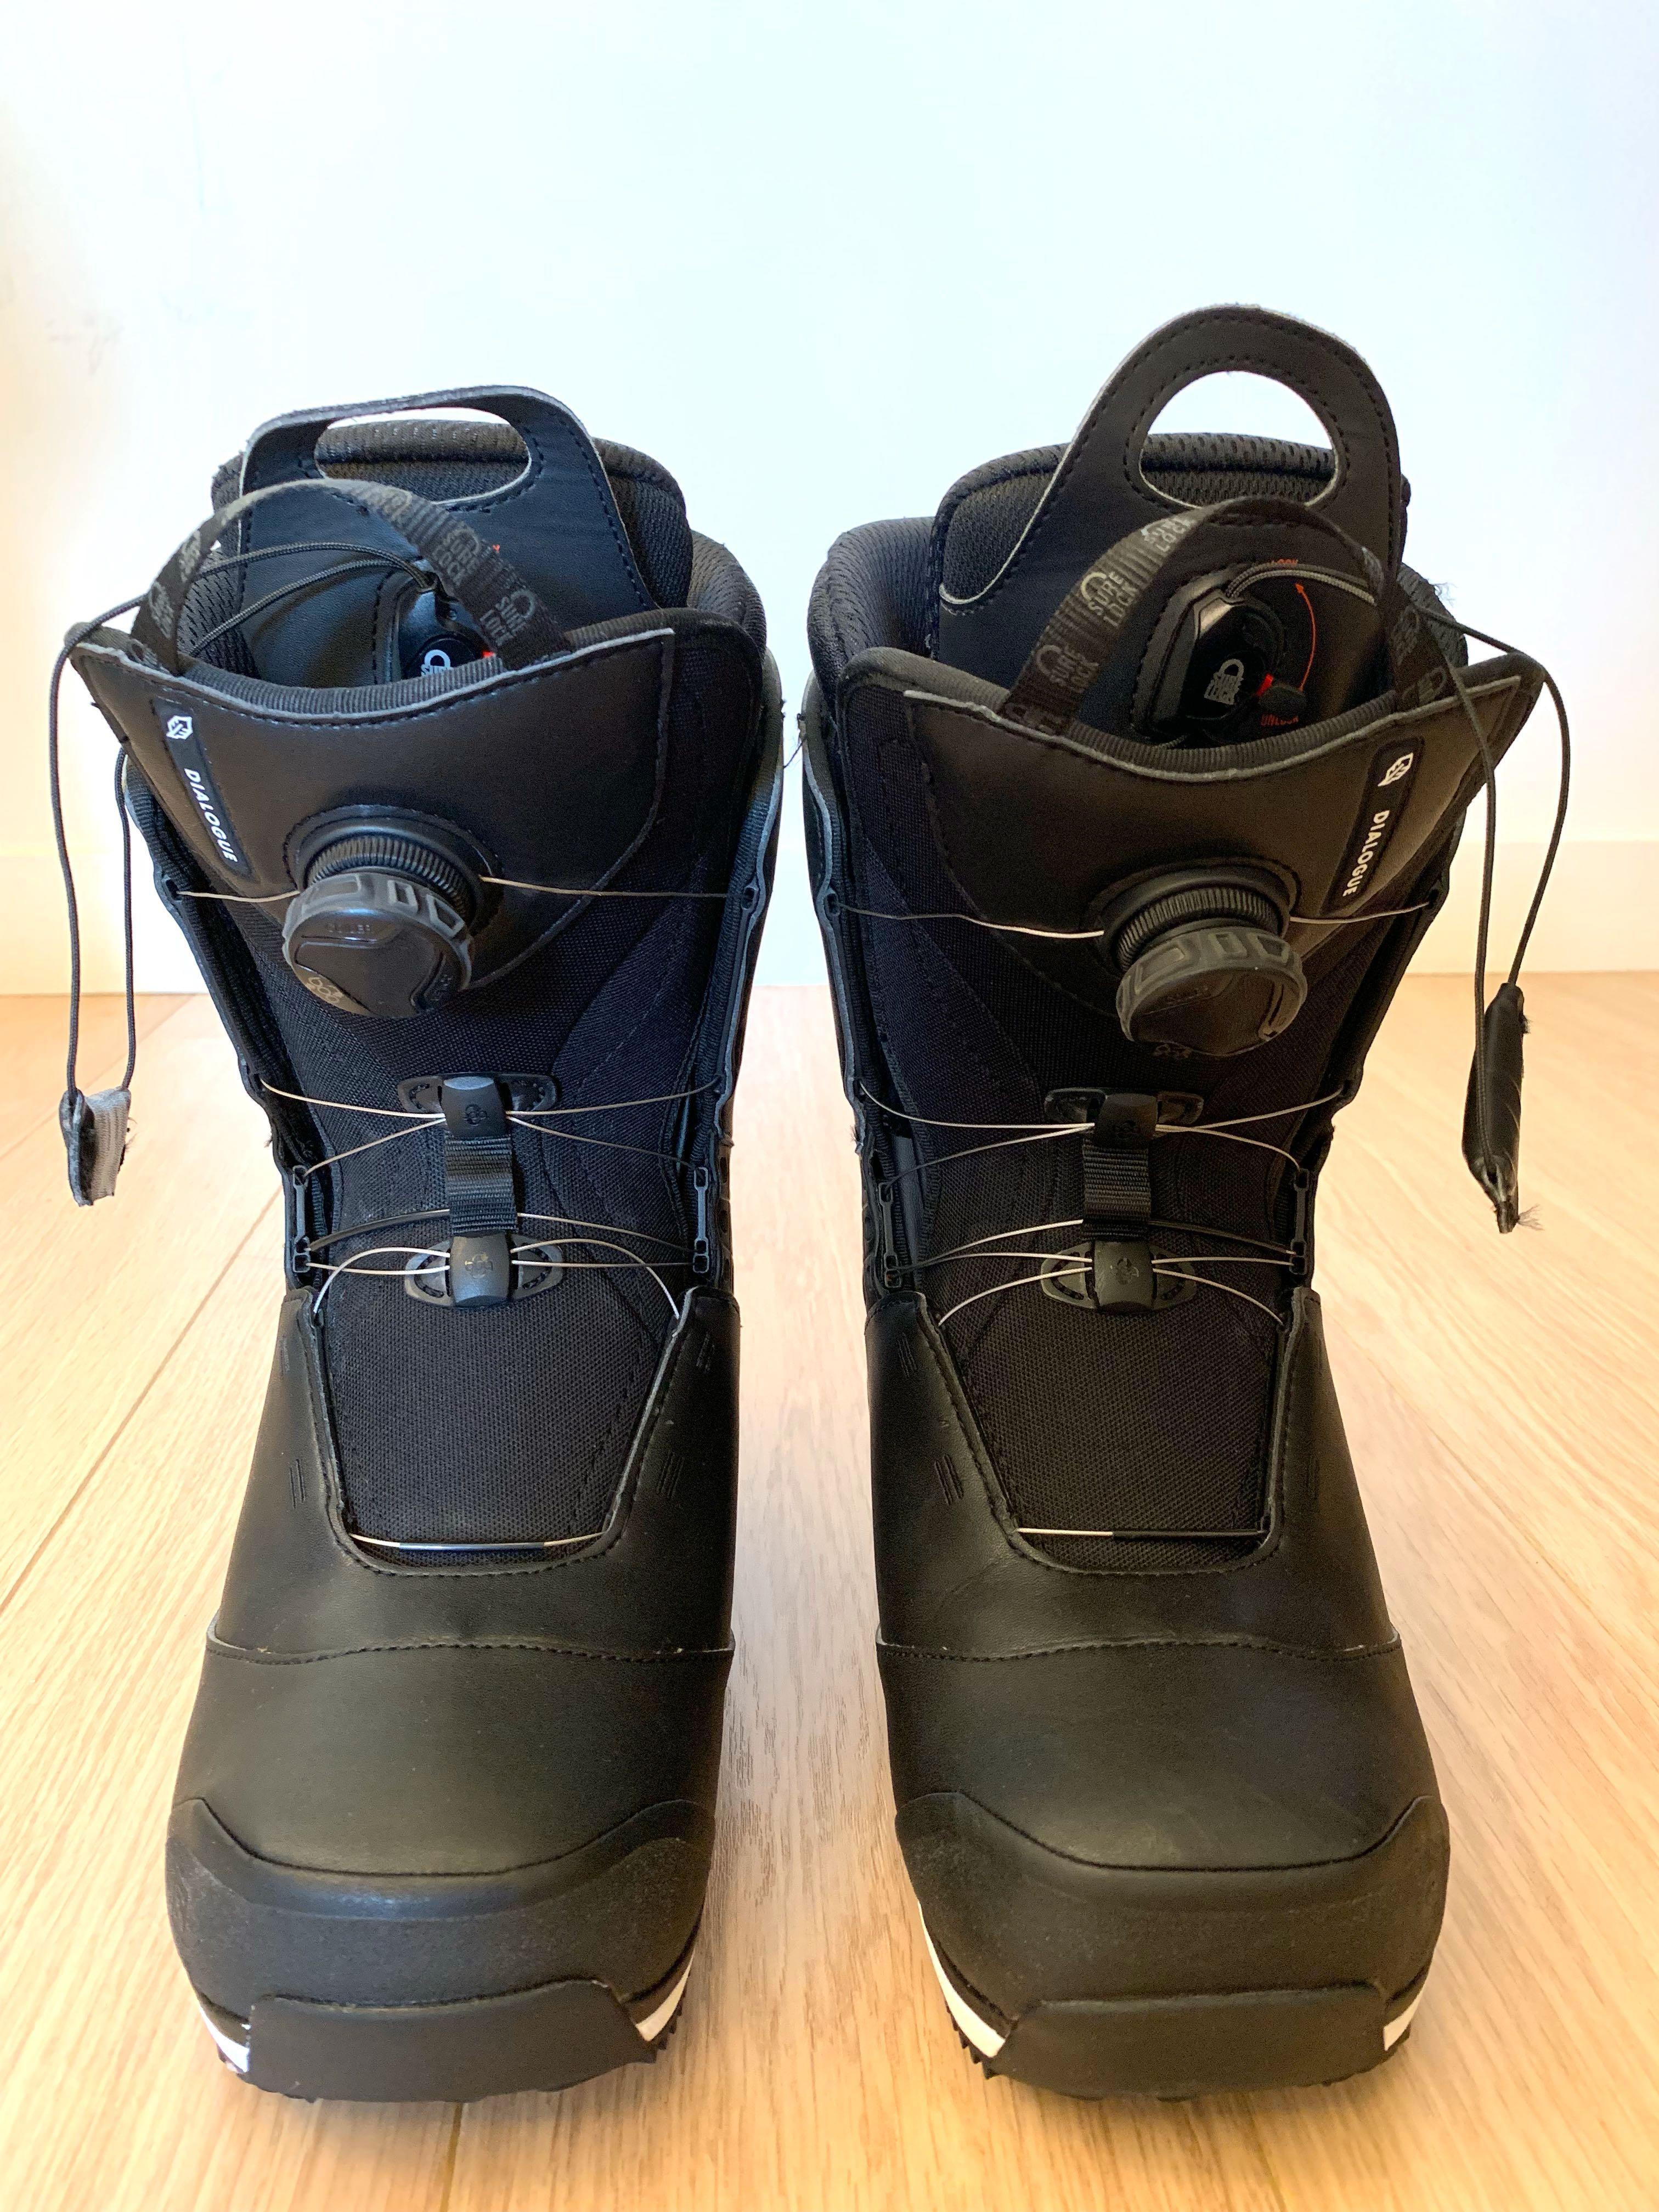 énorme réduction e210f 59020 Salomon Dialogue Focus BOA Snowboard Boot / US9